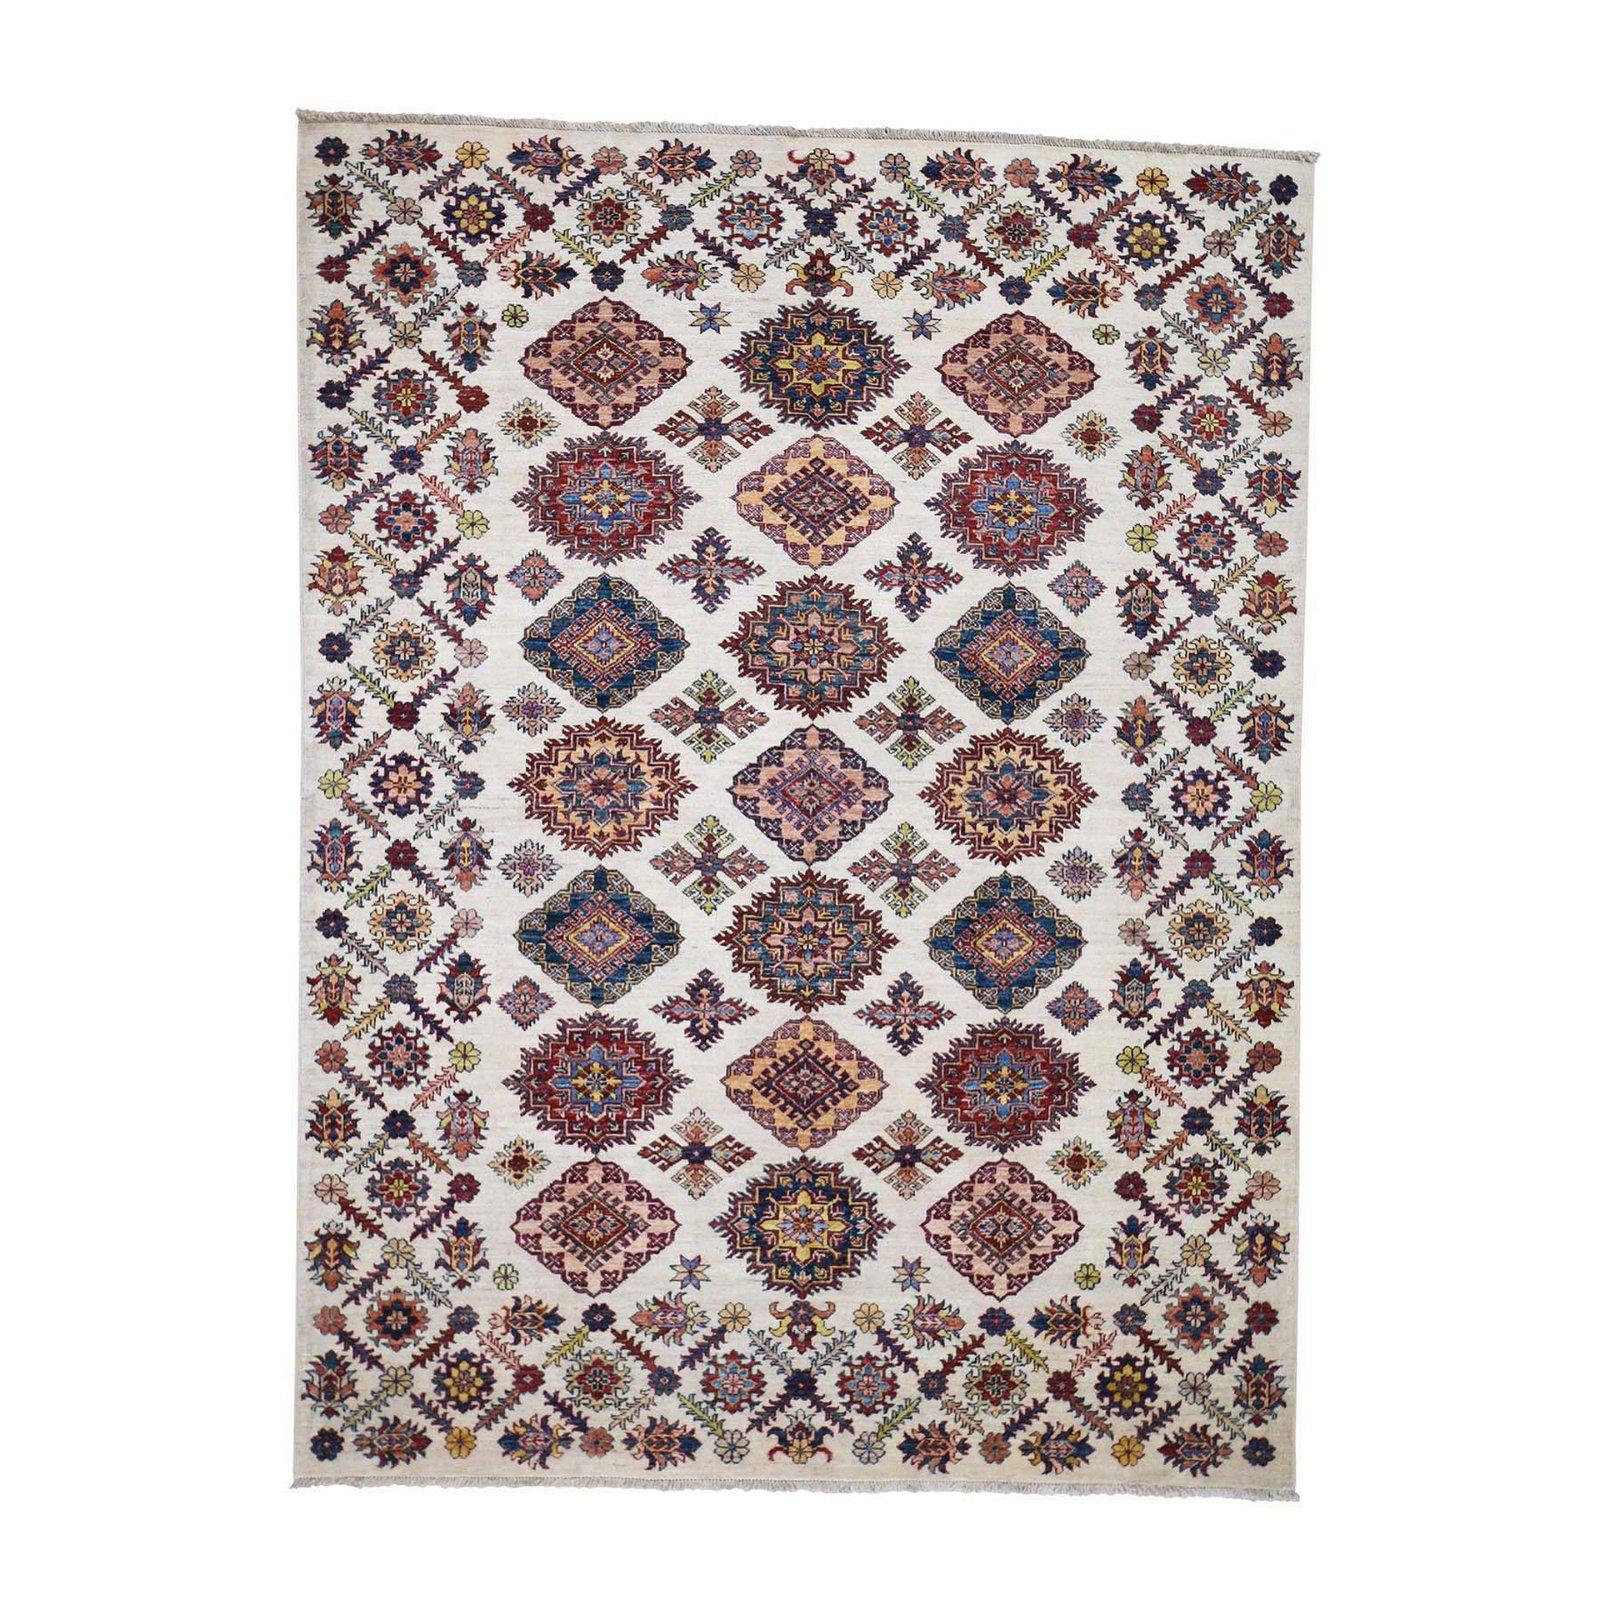 Super Kazak Pure Wool Geometric Design Hand-Knotted